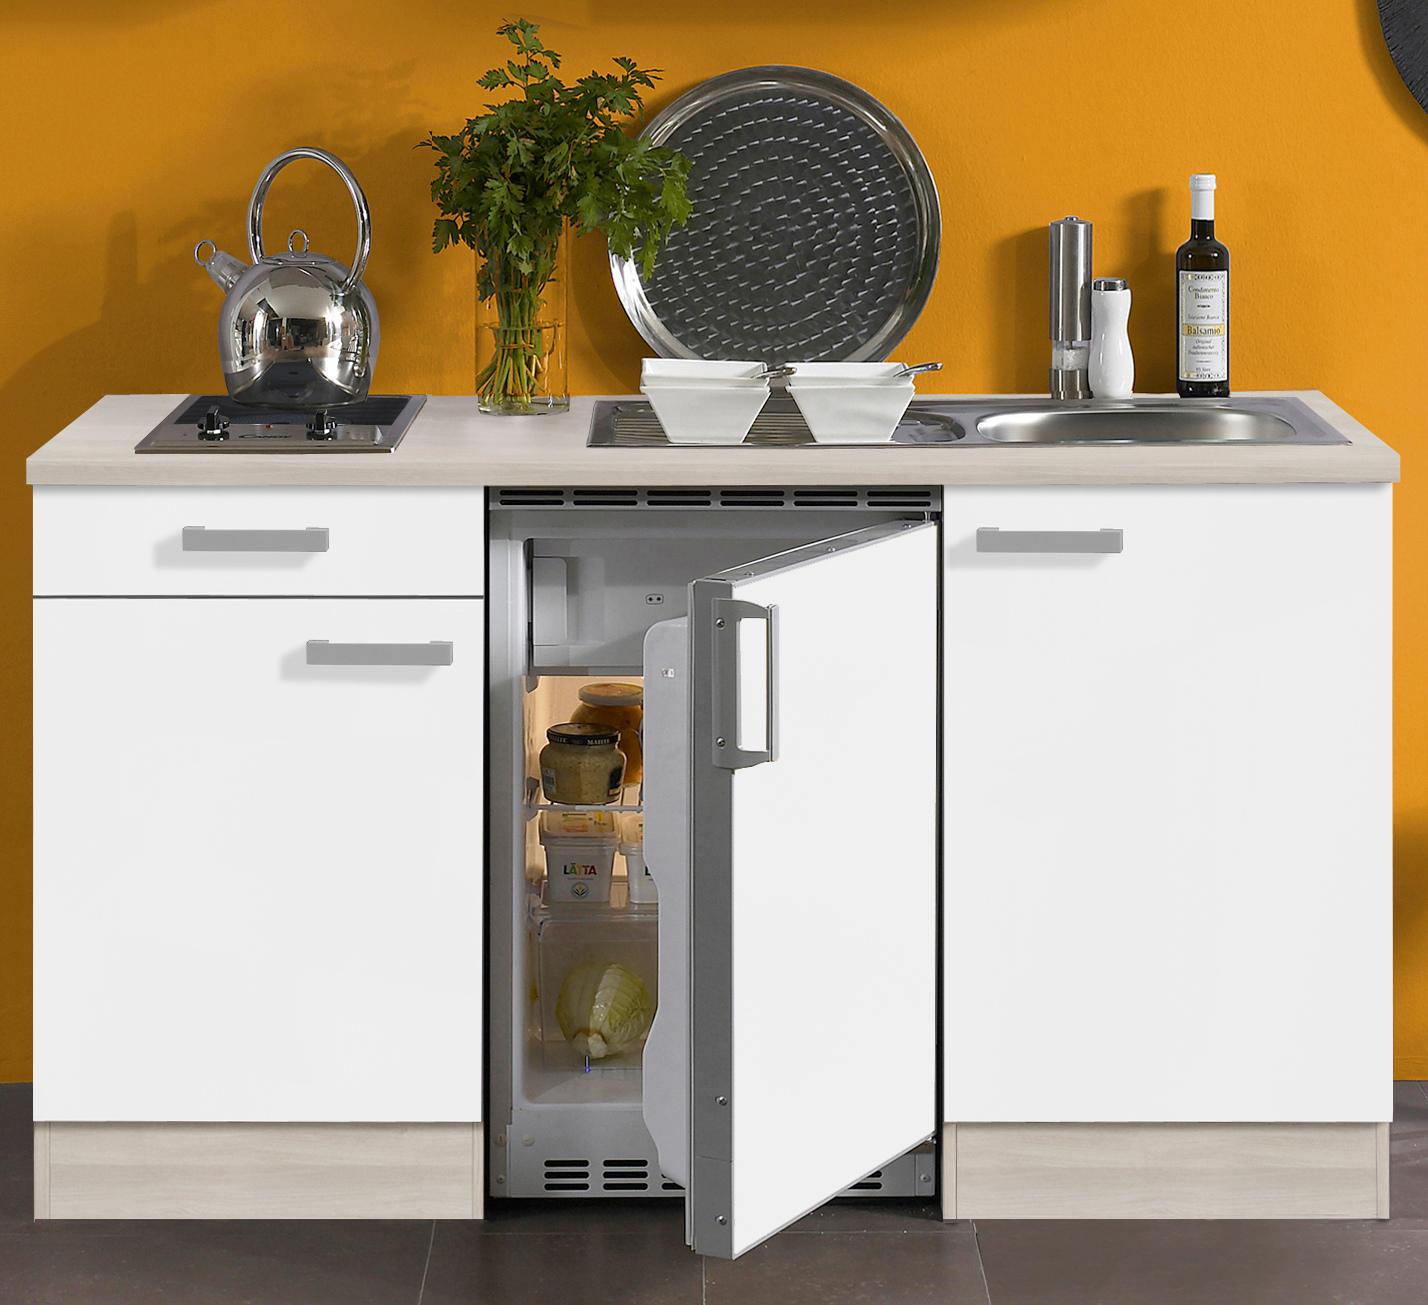 singlek che barcelona vario 1 mit glaskeramikkochfeld breite 150 cm wei k che singlek chen. Black Bedroom Furniture Sets. Home Design Ideas